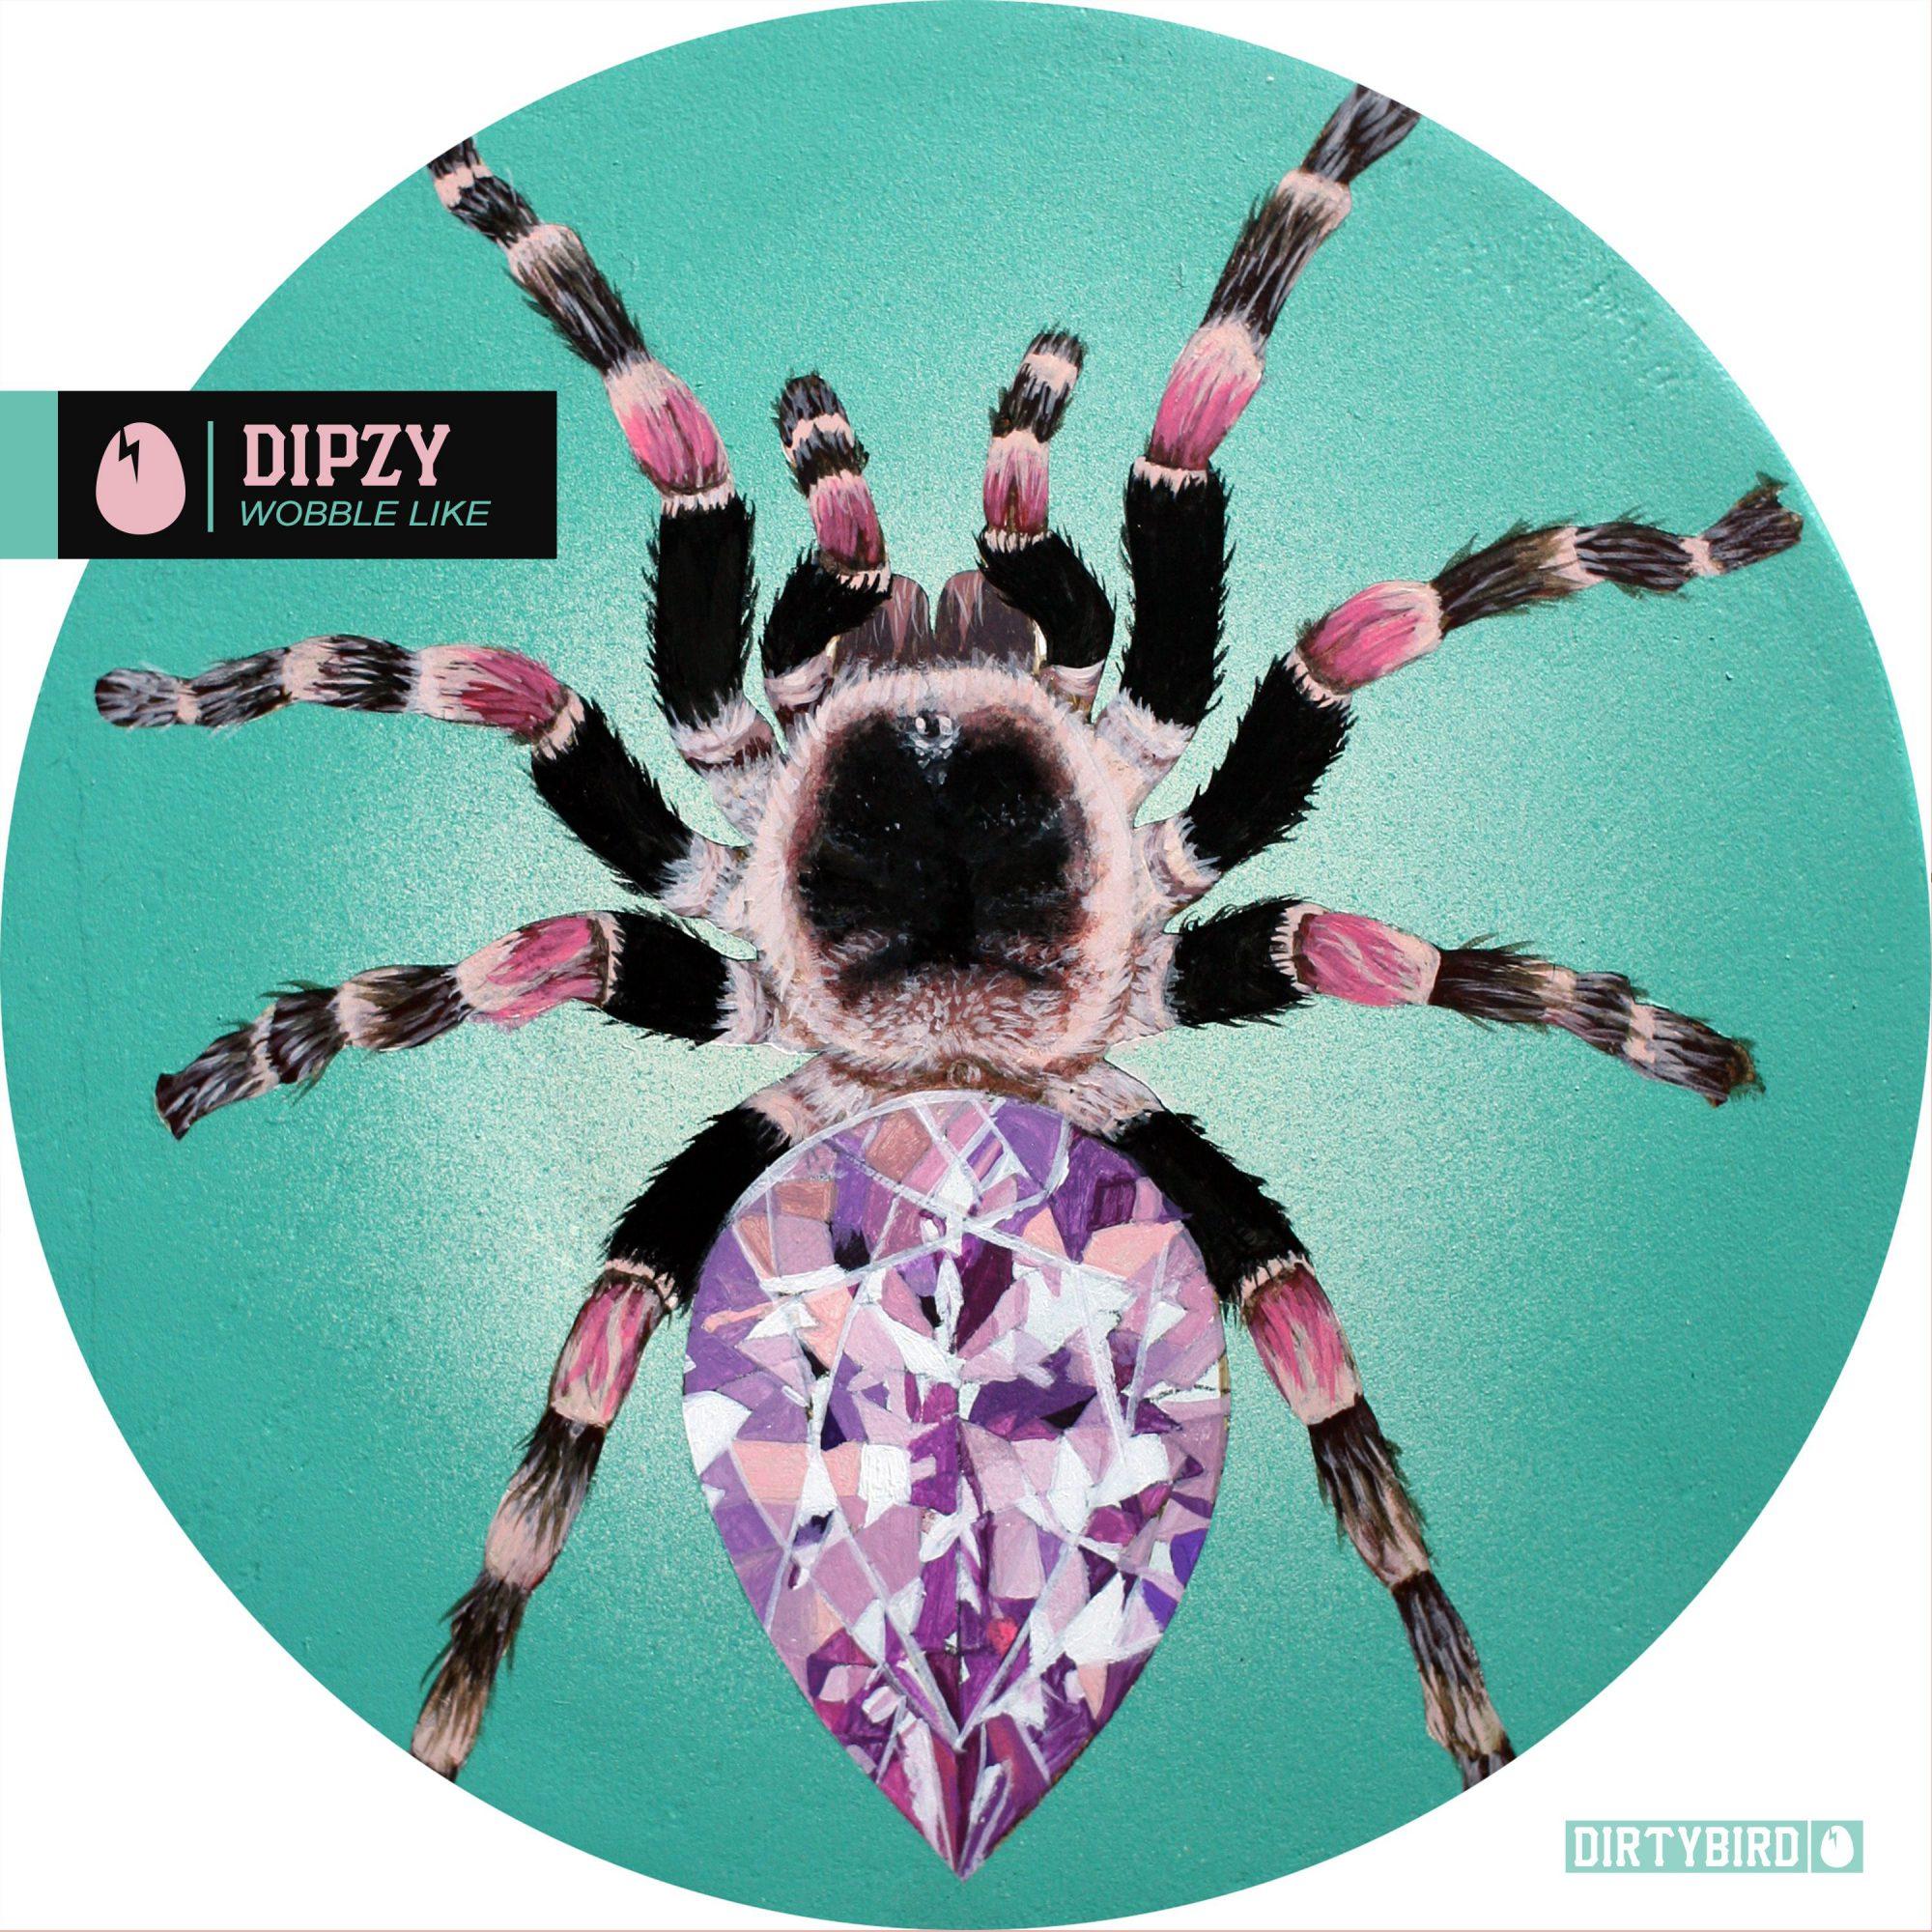 Dipzy Wobble Like EP Dirtybird